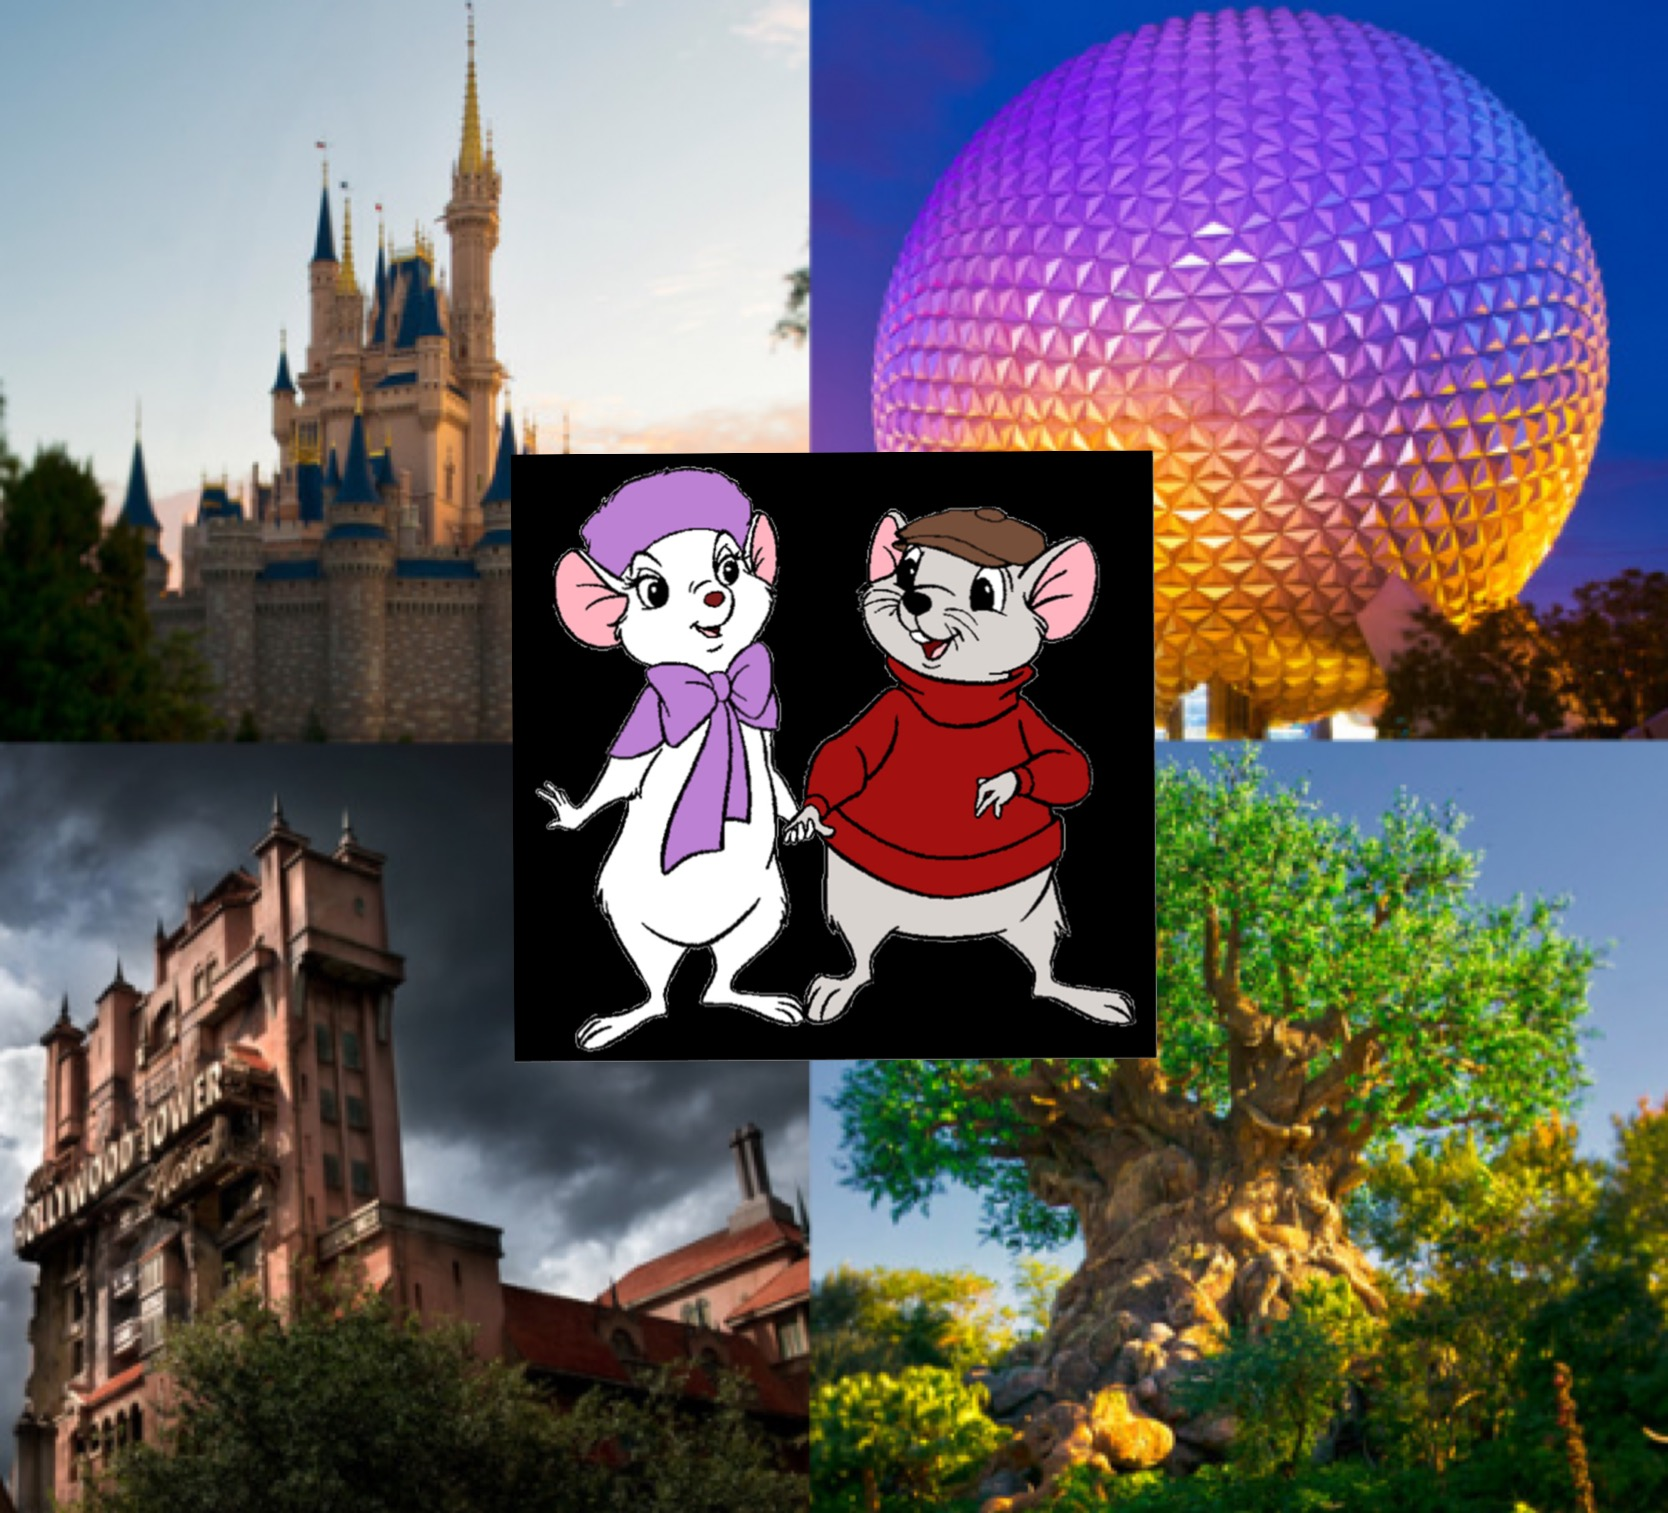 Ratigan6688/Walt Disney World-Bianca Rides or Bernard Rides?